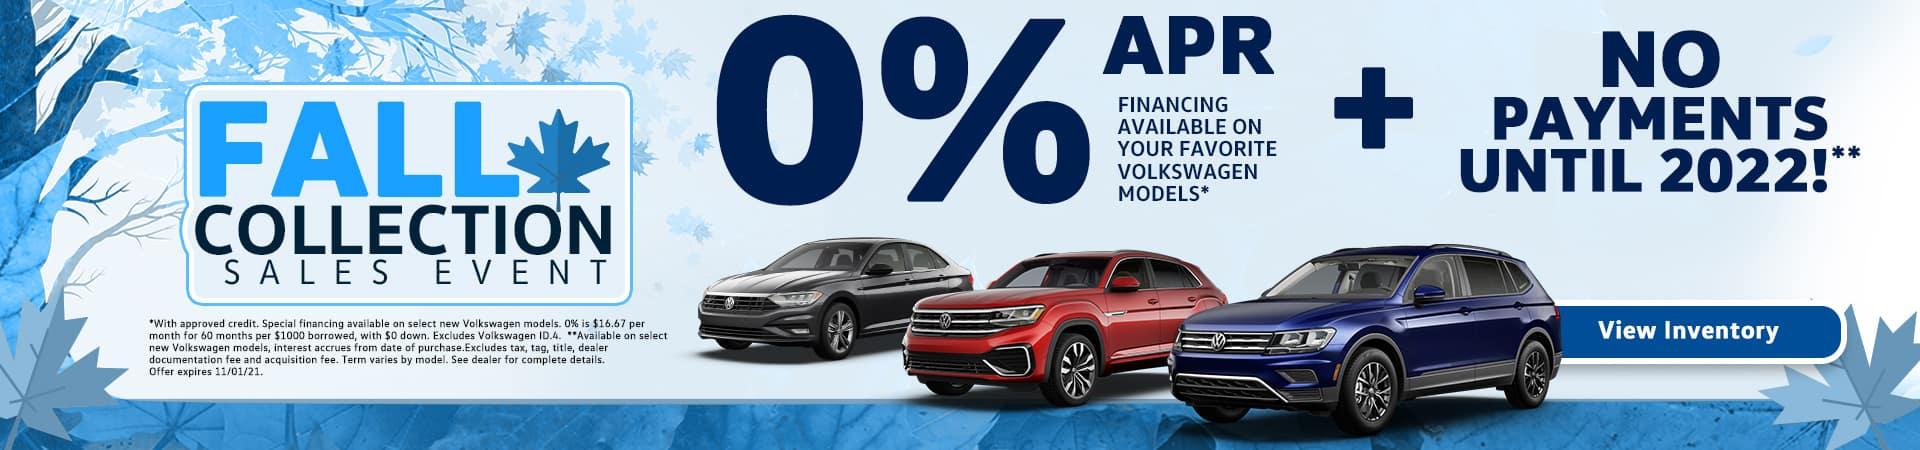 New Volkswagen Models for Sale in Tampa, FL